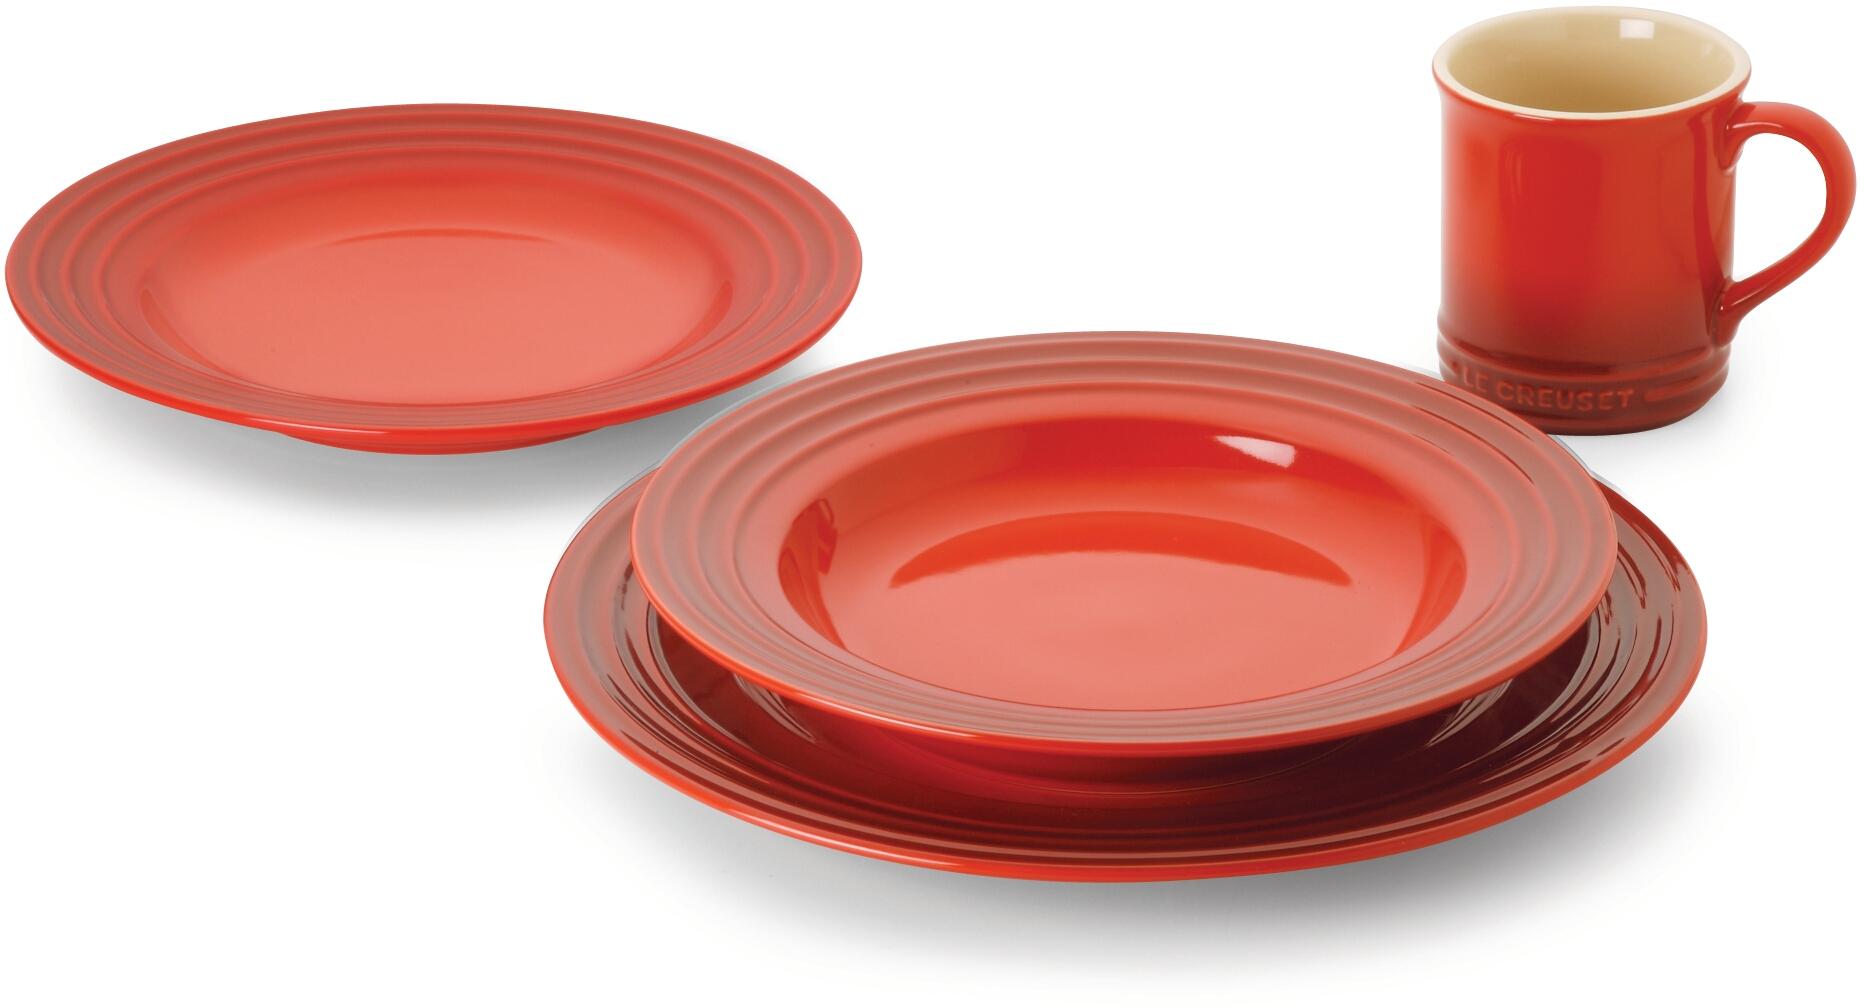 Le Creuset 16 Piece Cherry Stoneware Dinnerware Set, Service for 4